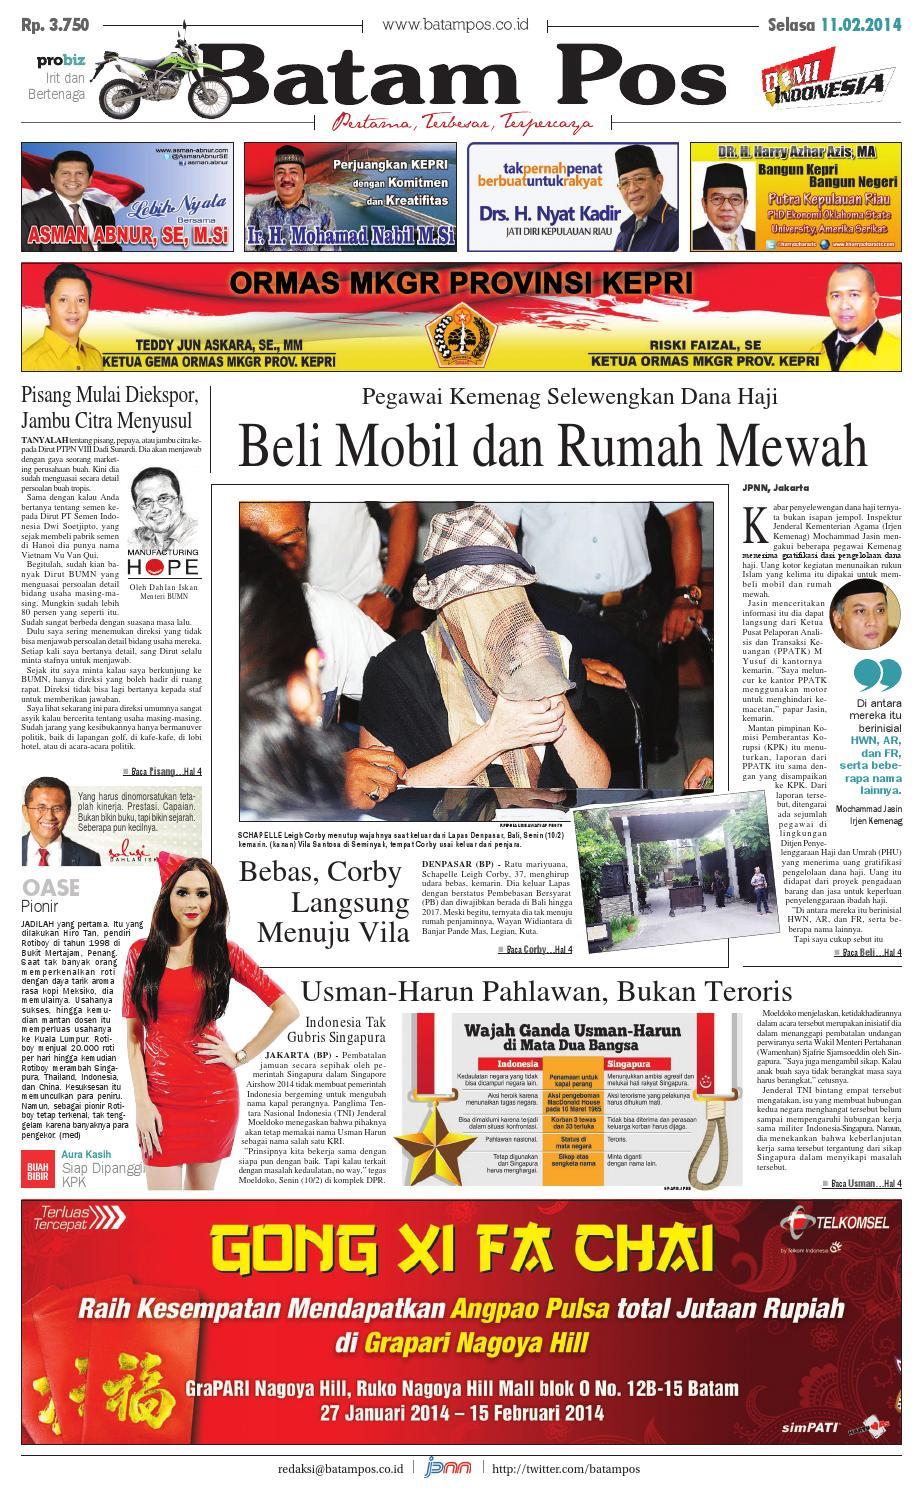 11 Februari 2014 By Batampos Newspaper Issuu Bra Set Wanita Sexy Transparan Metalik 8302